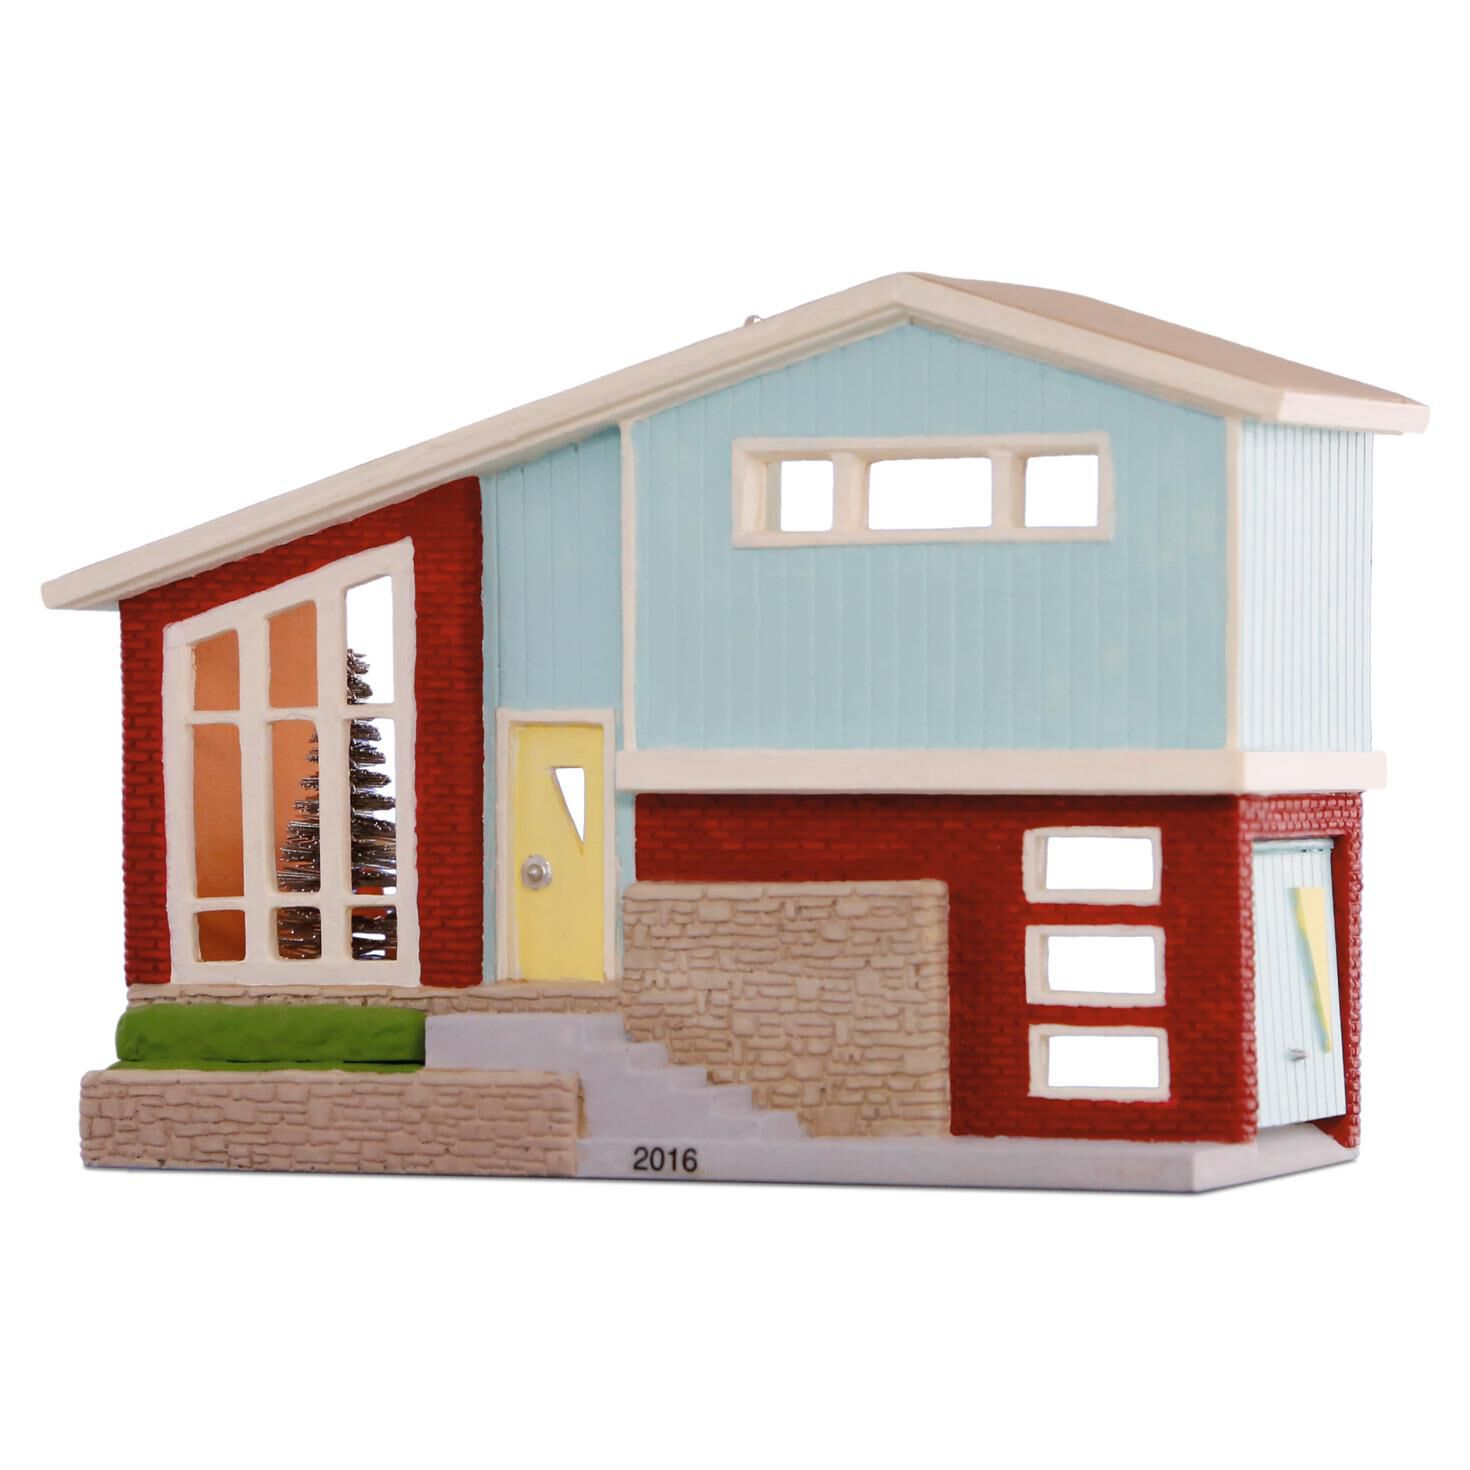 nostalgic houses and shops split level dream home ornament